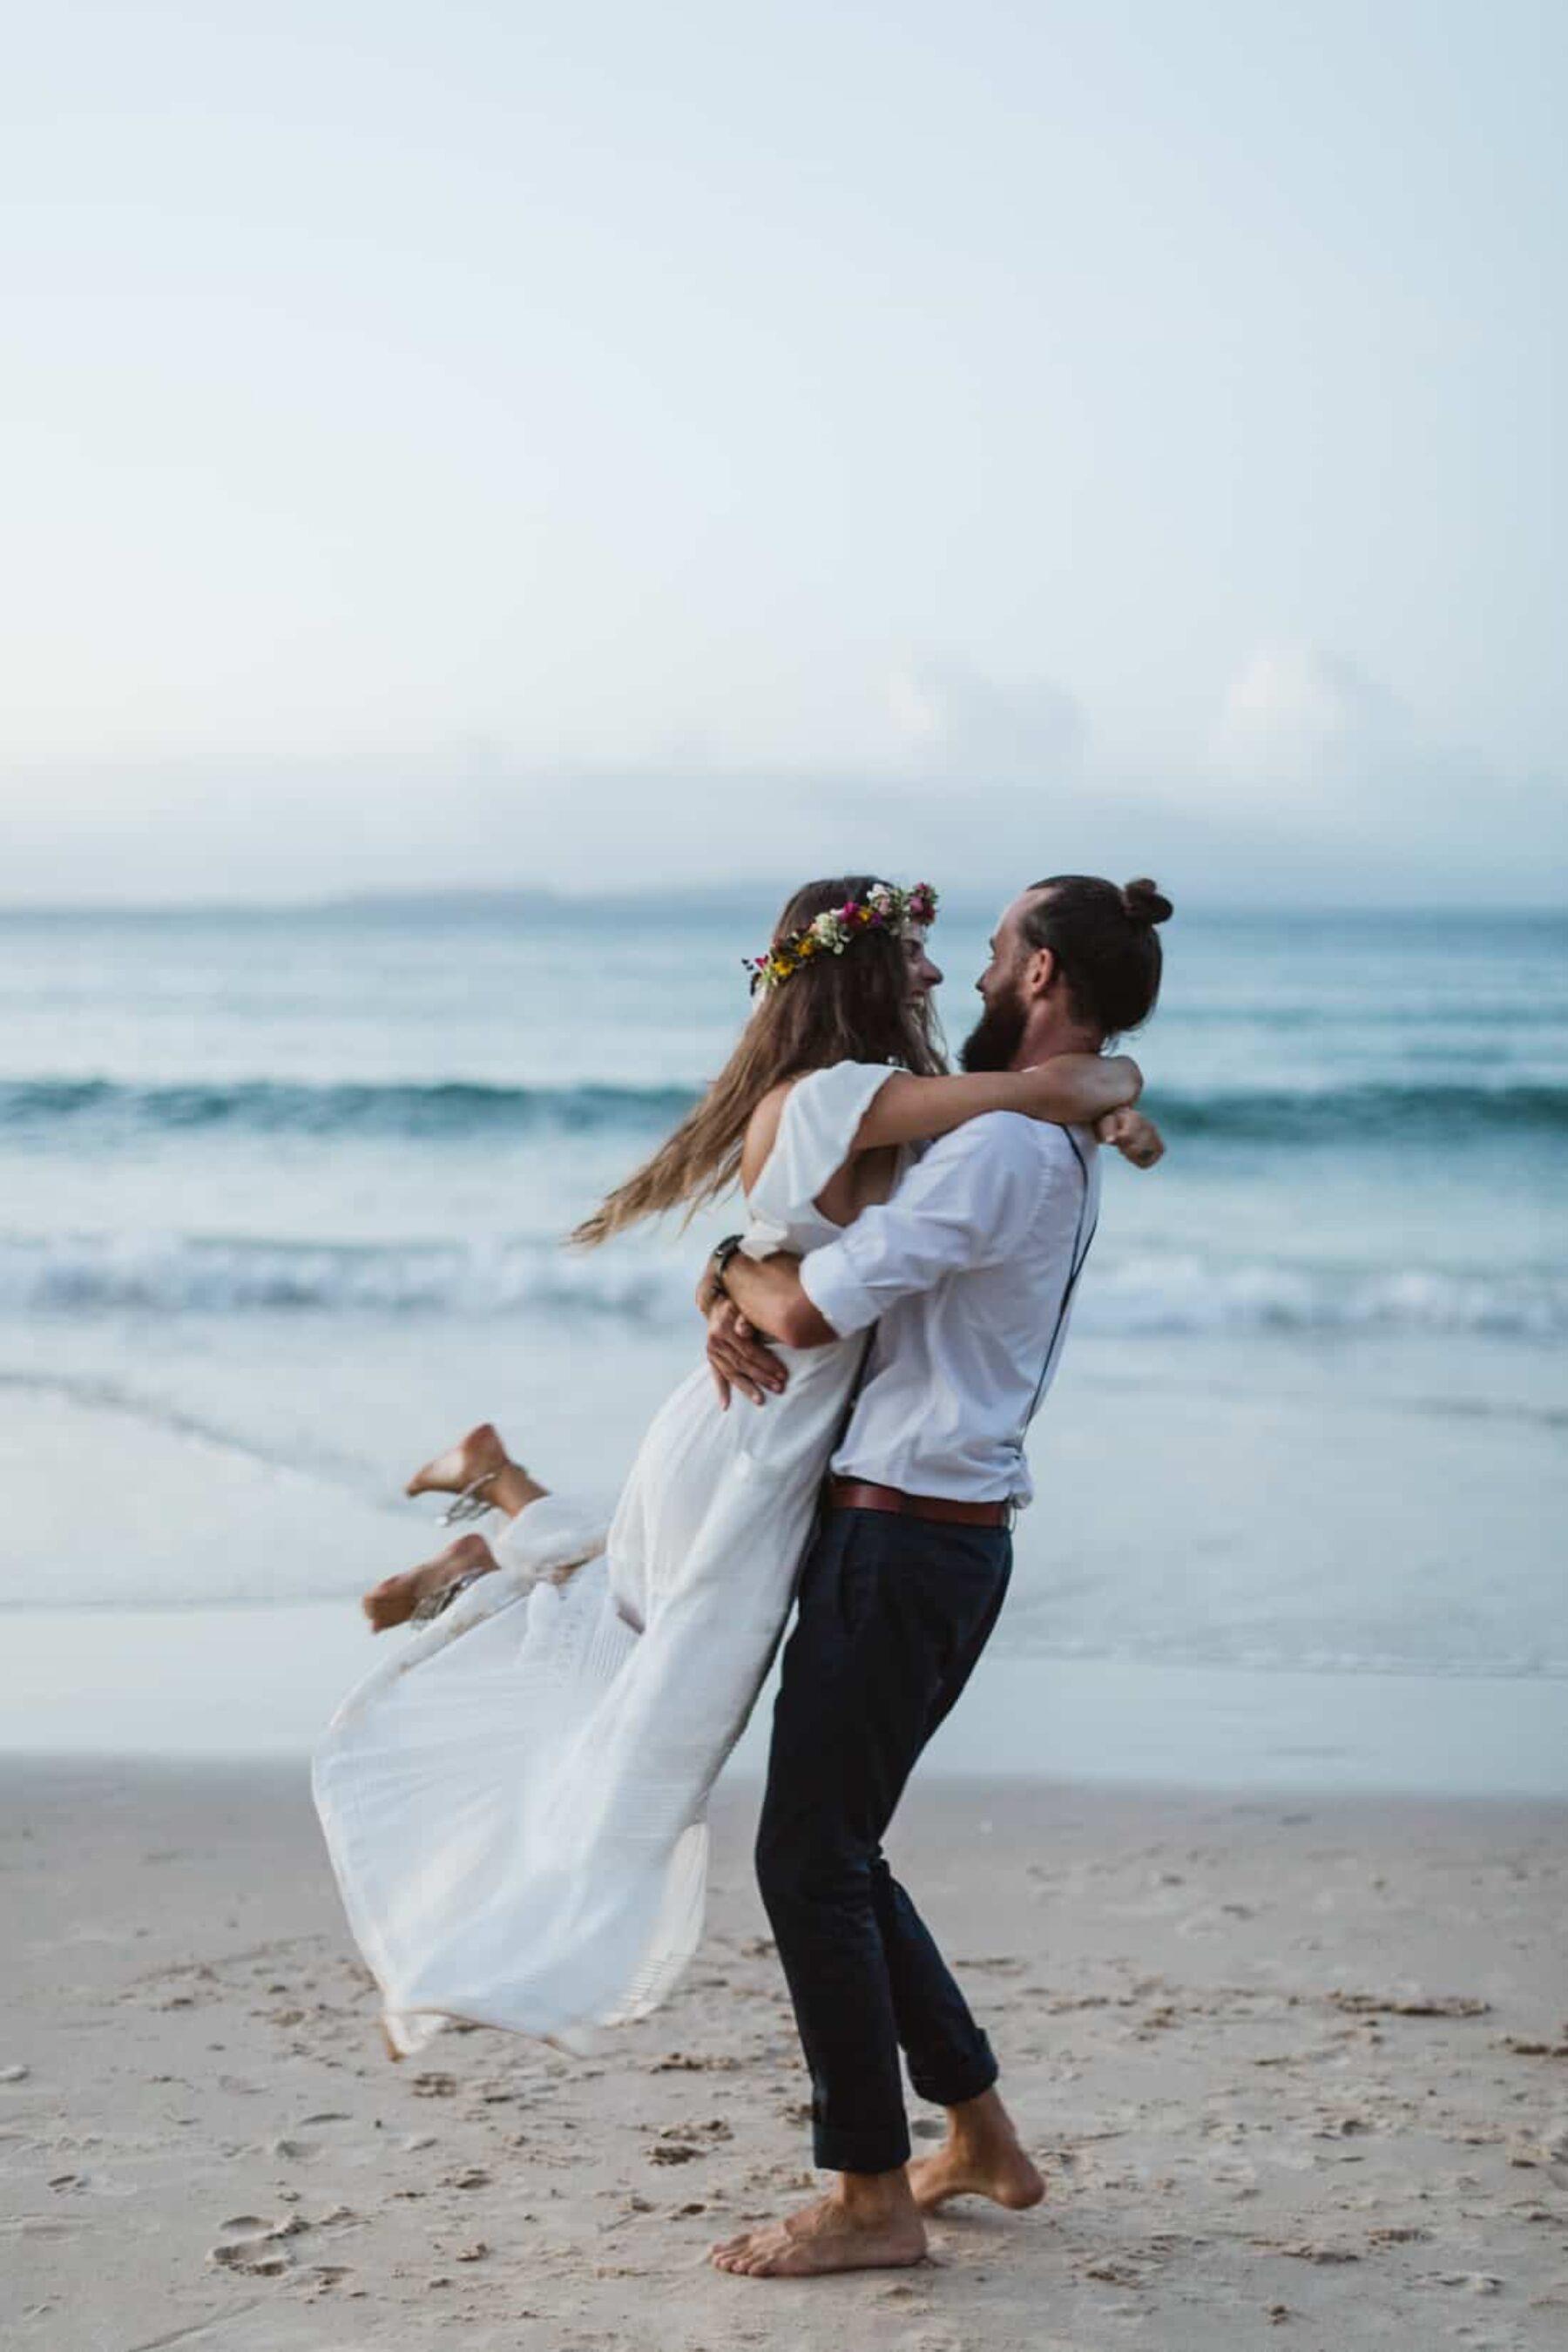 Barefoot Noosa elopement - photography by Janneke Storm